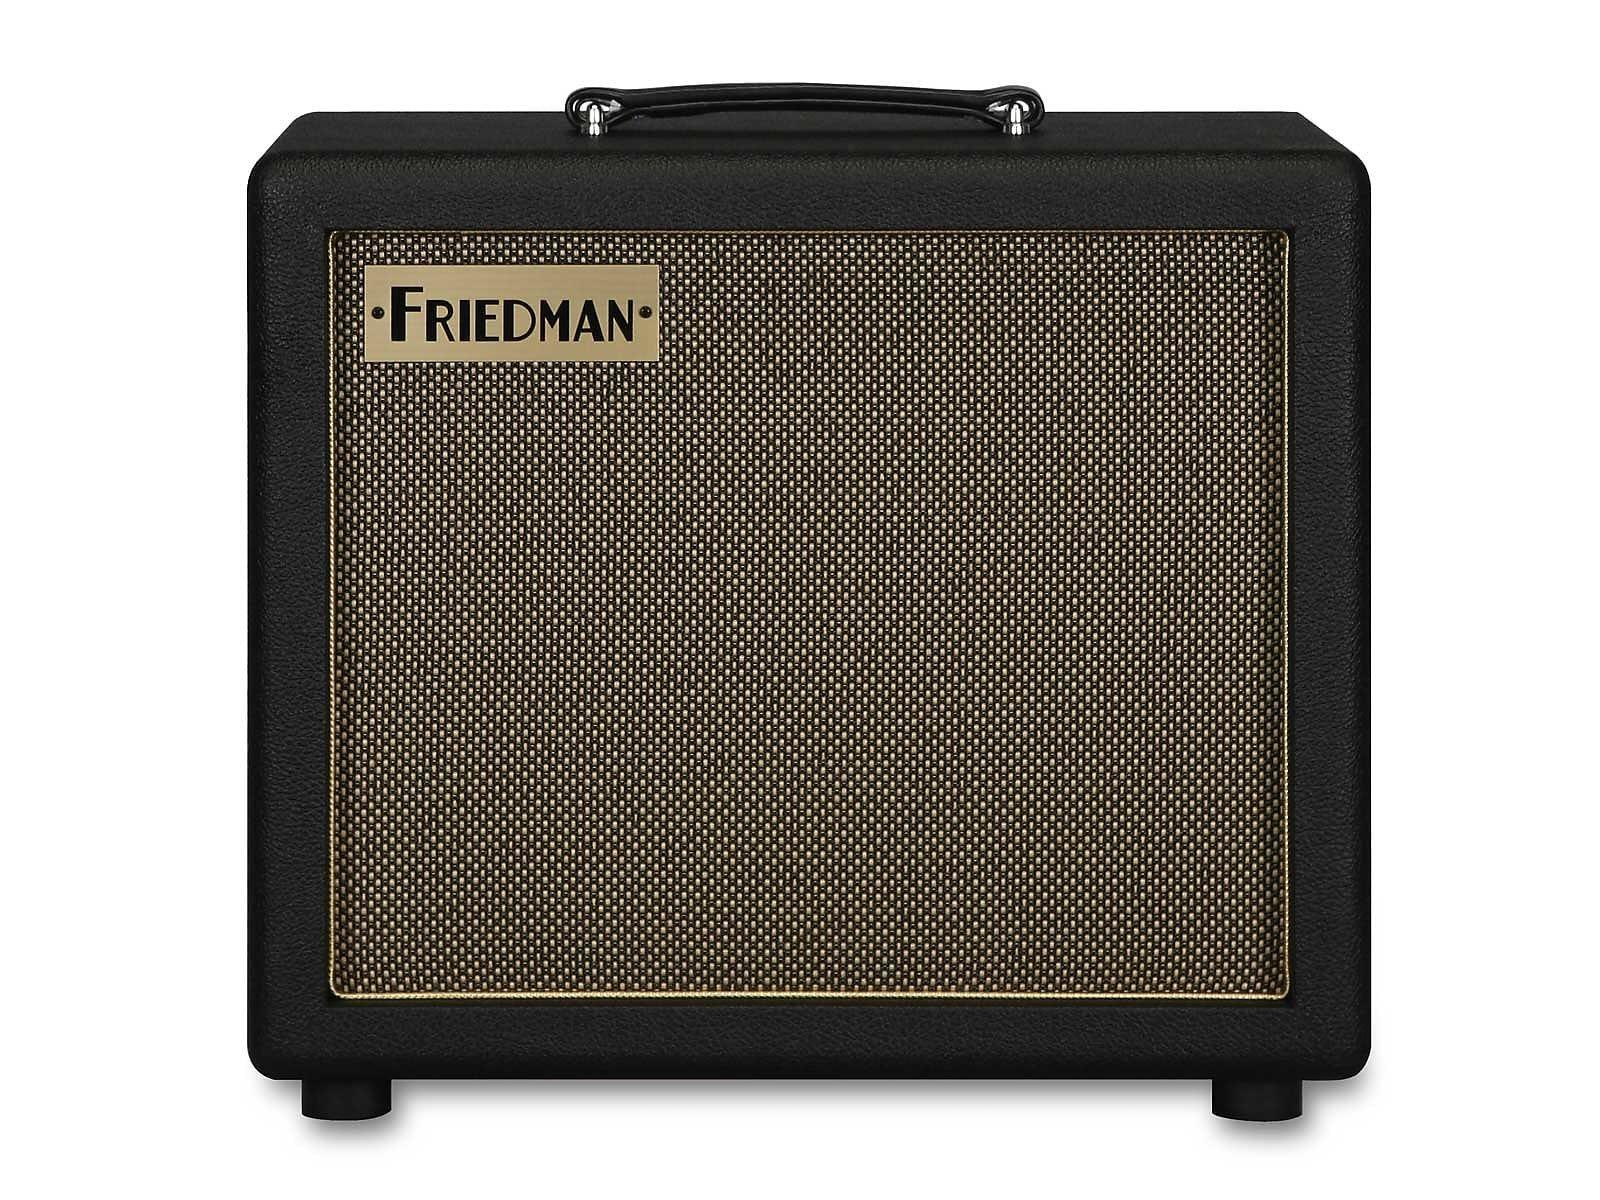 Friedman Runt 112 Cab Black Creamback